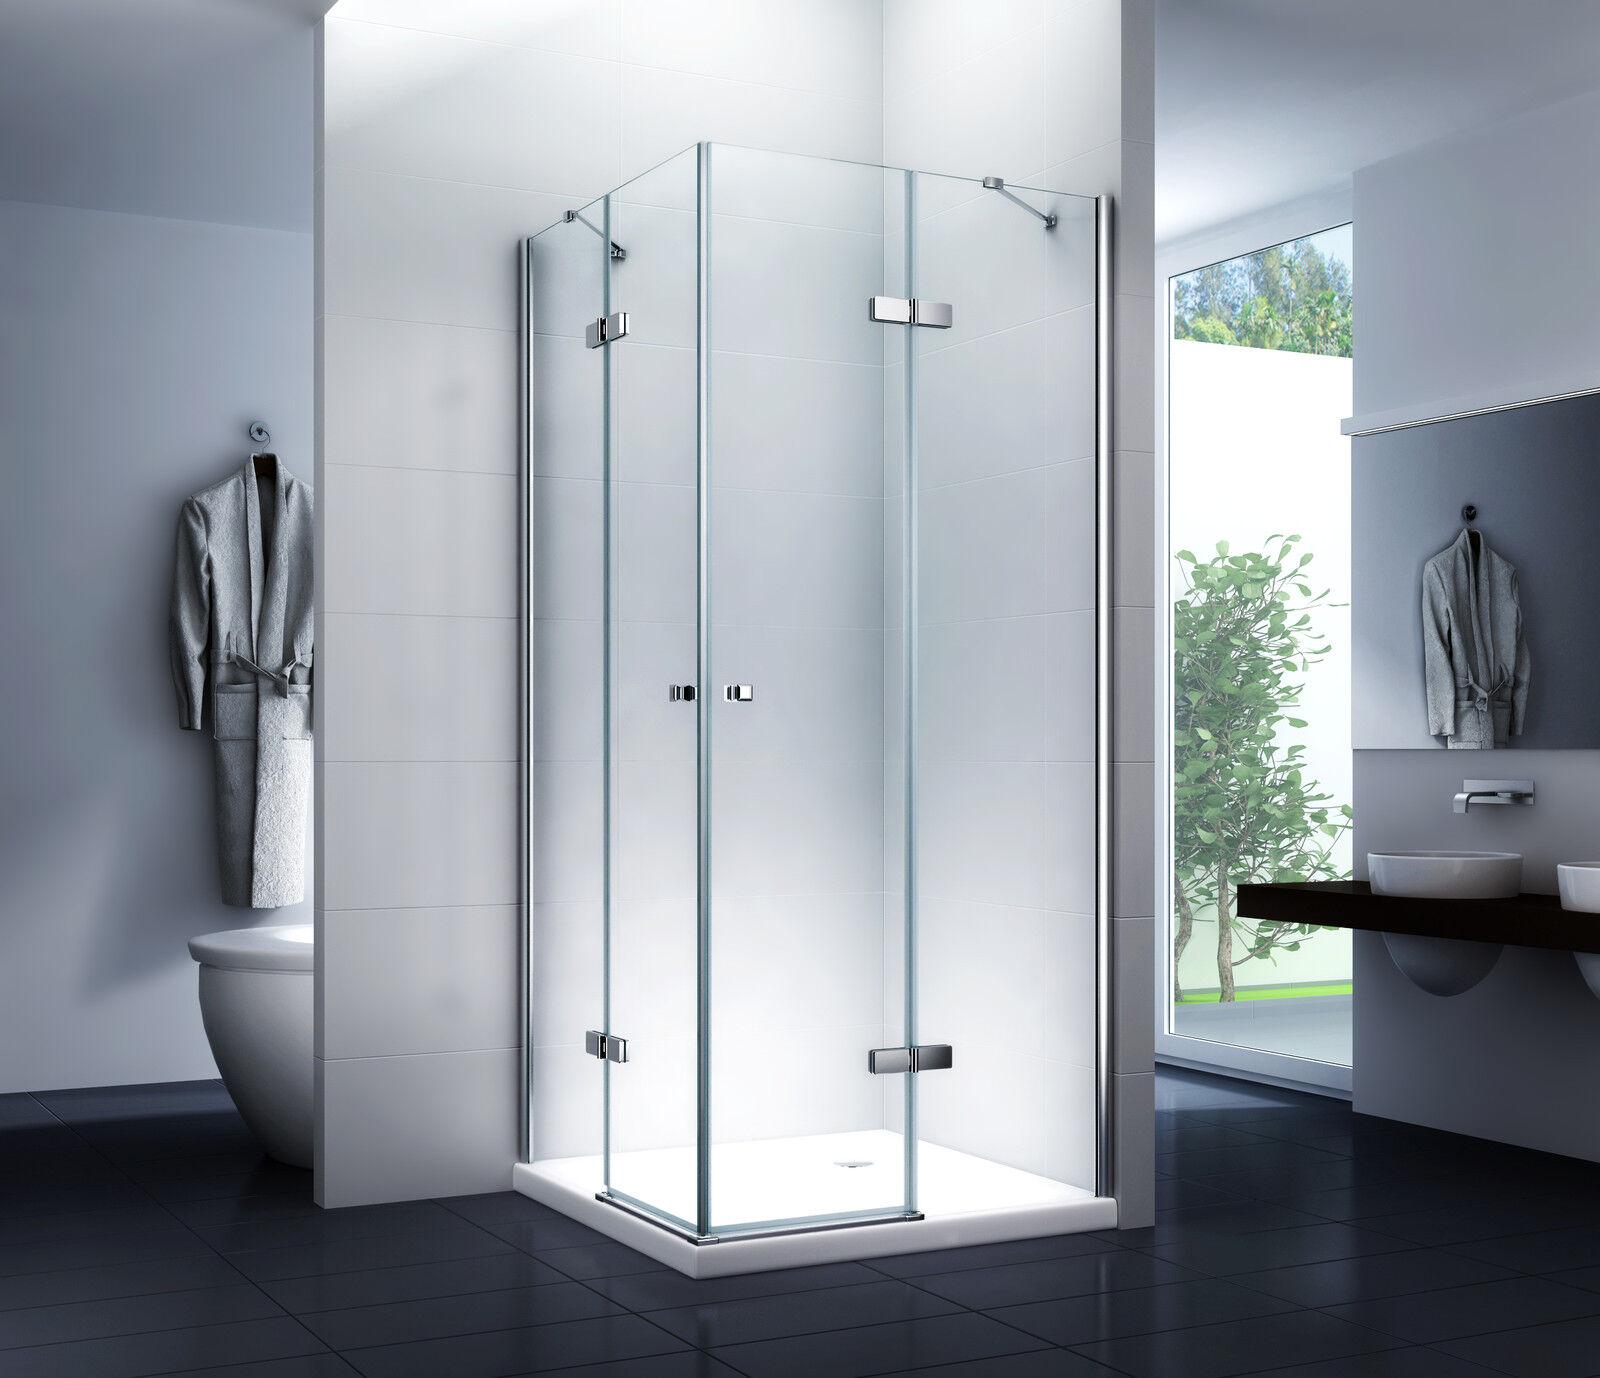 Duschkabine - Duschwand - Dusche -  Sina 100x80x195cm   8mm   ohne Duschtasse